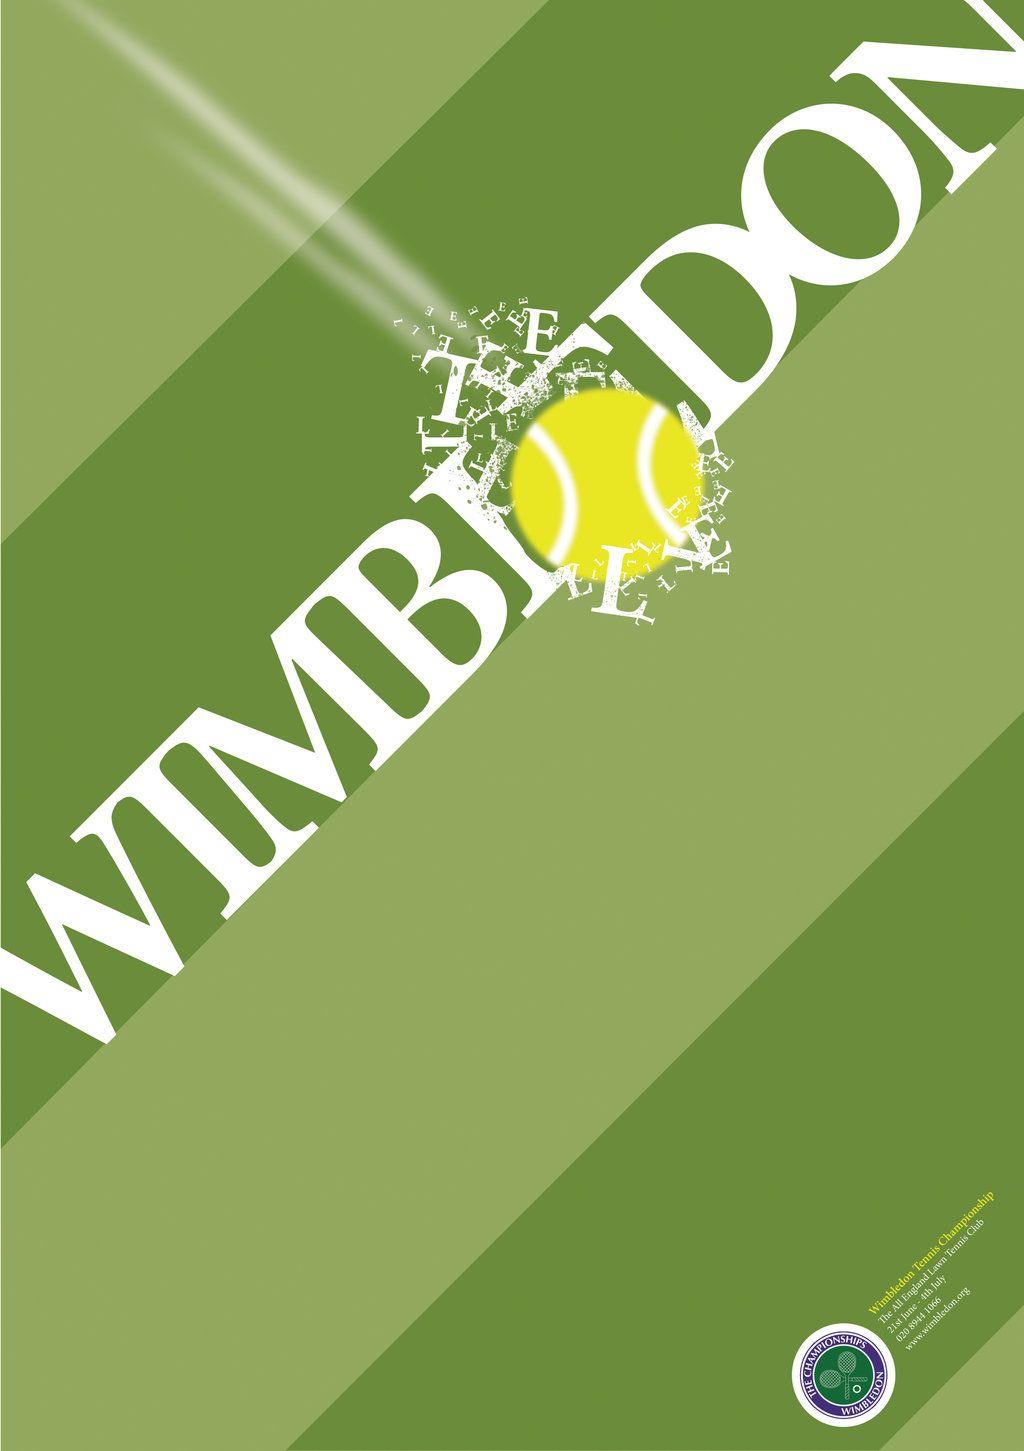 Wimbledon Poster Wimbledon Tennis Posters Sports Graphic Design